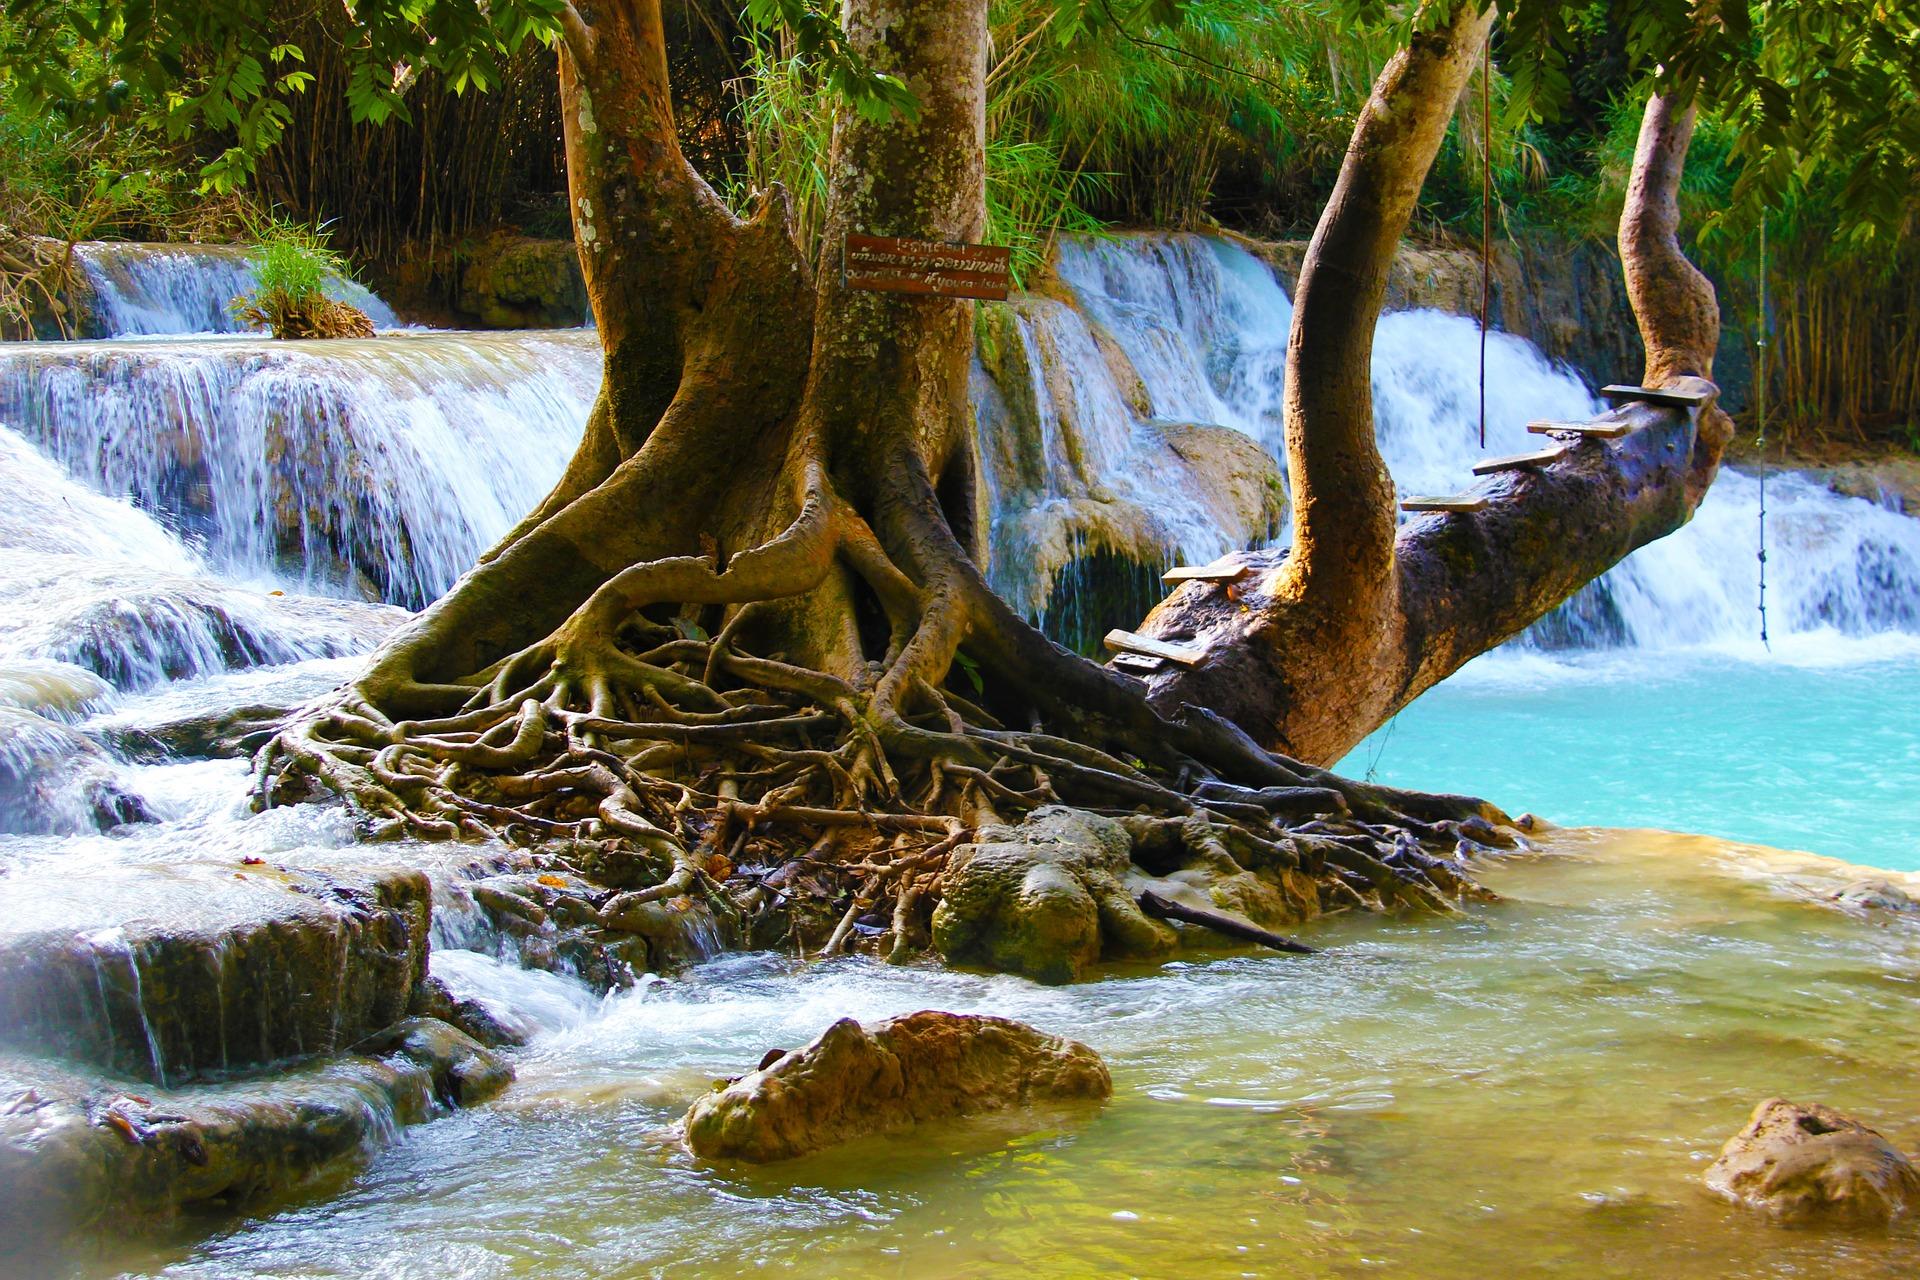 Wasserfall im Khao Lak Nationalpark - Badeurlaub in Thailand